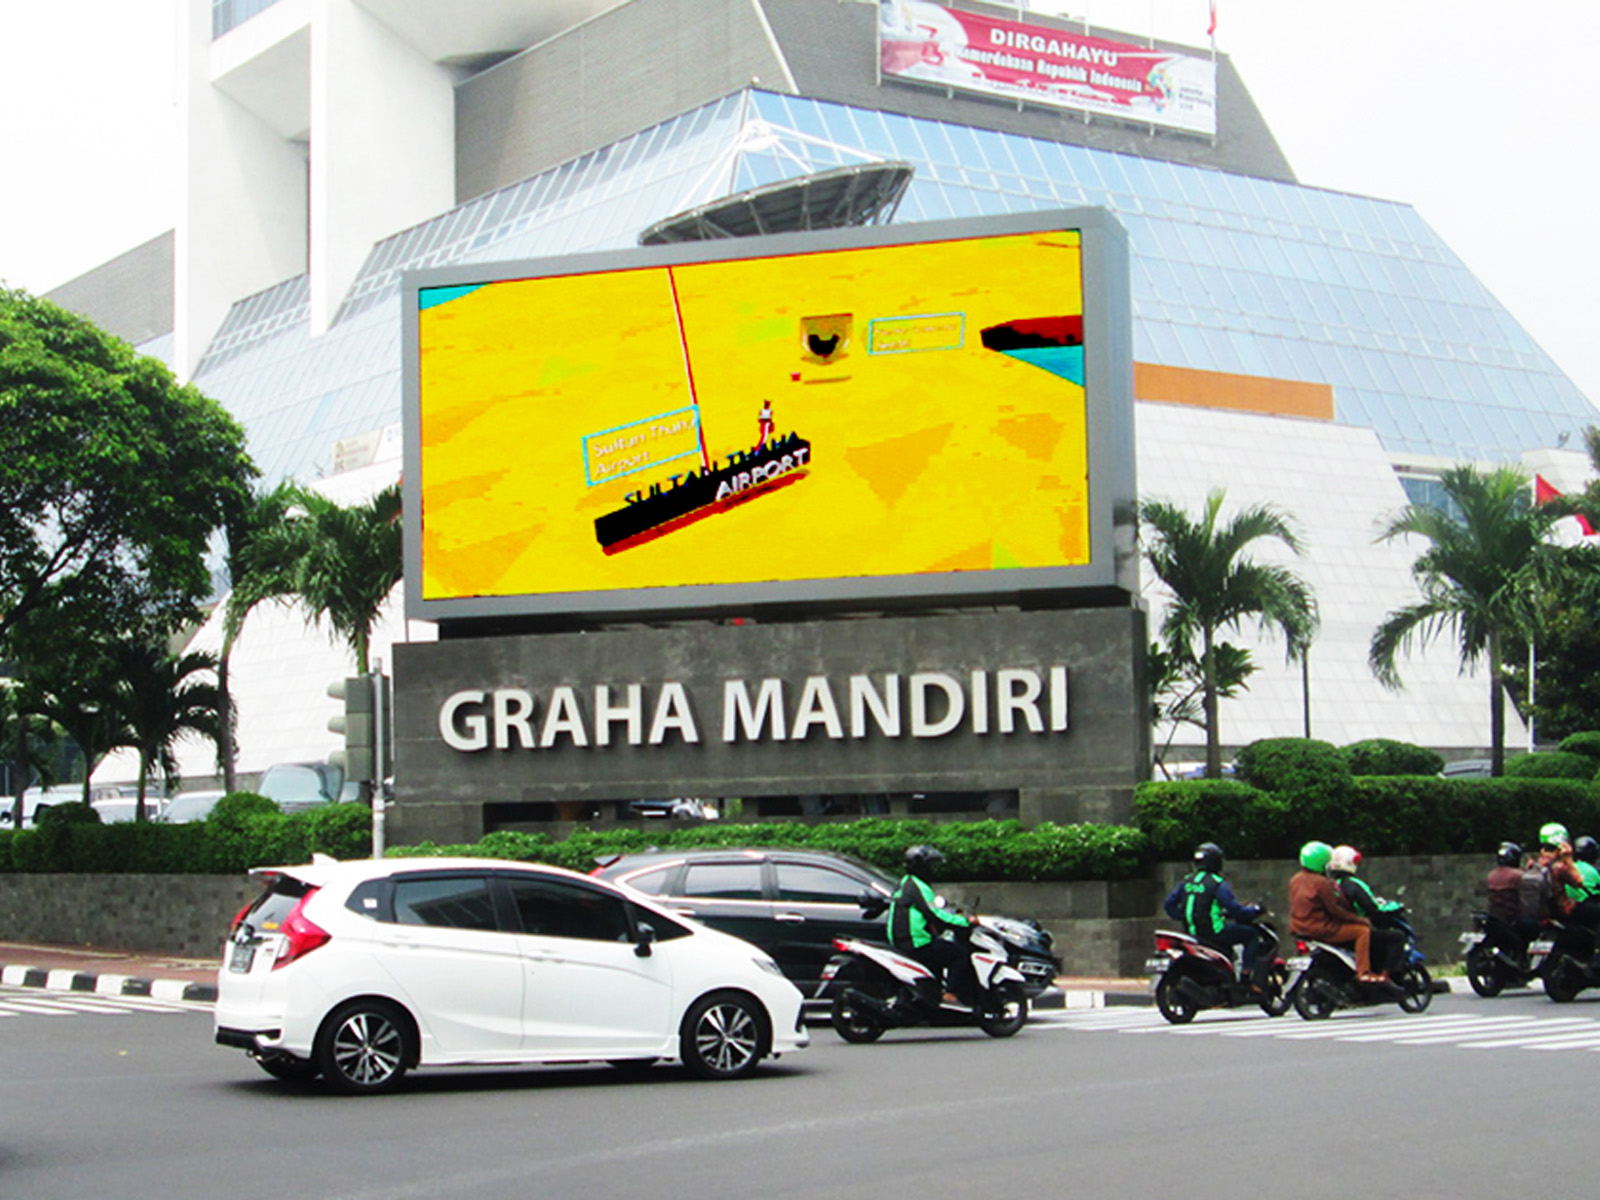 Videotron Graha Mandiri - 4 m x 8 m Horizontal